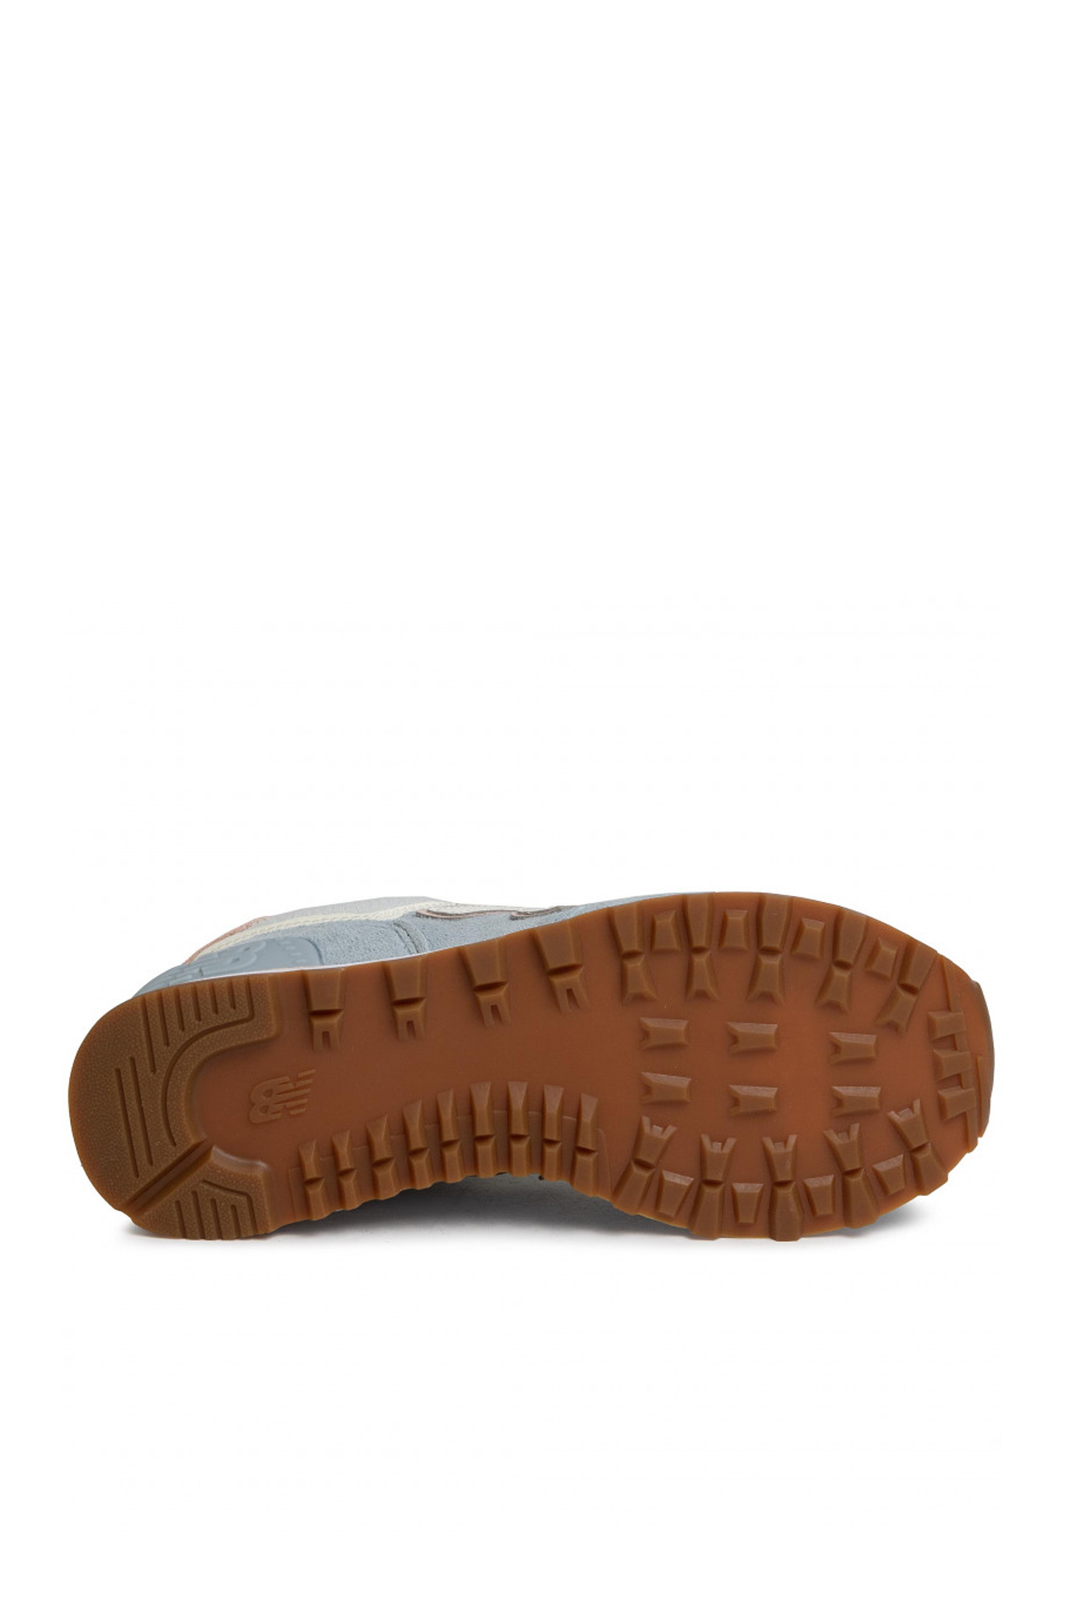 Chaussures  New balance WL574SUO suo